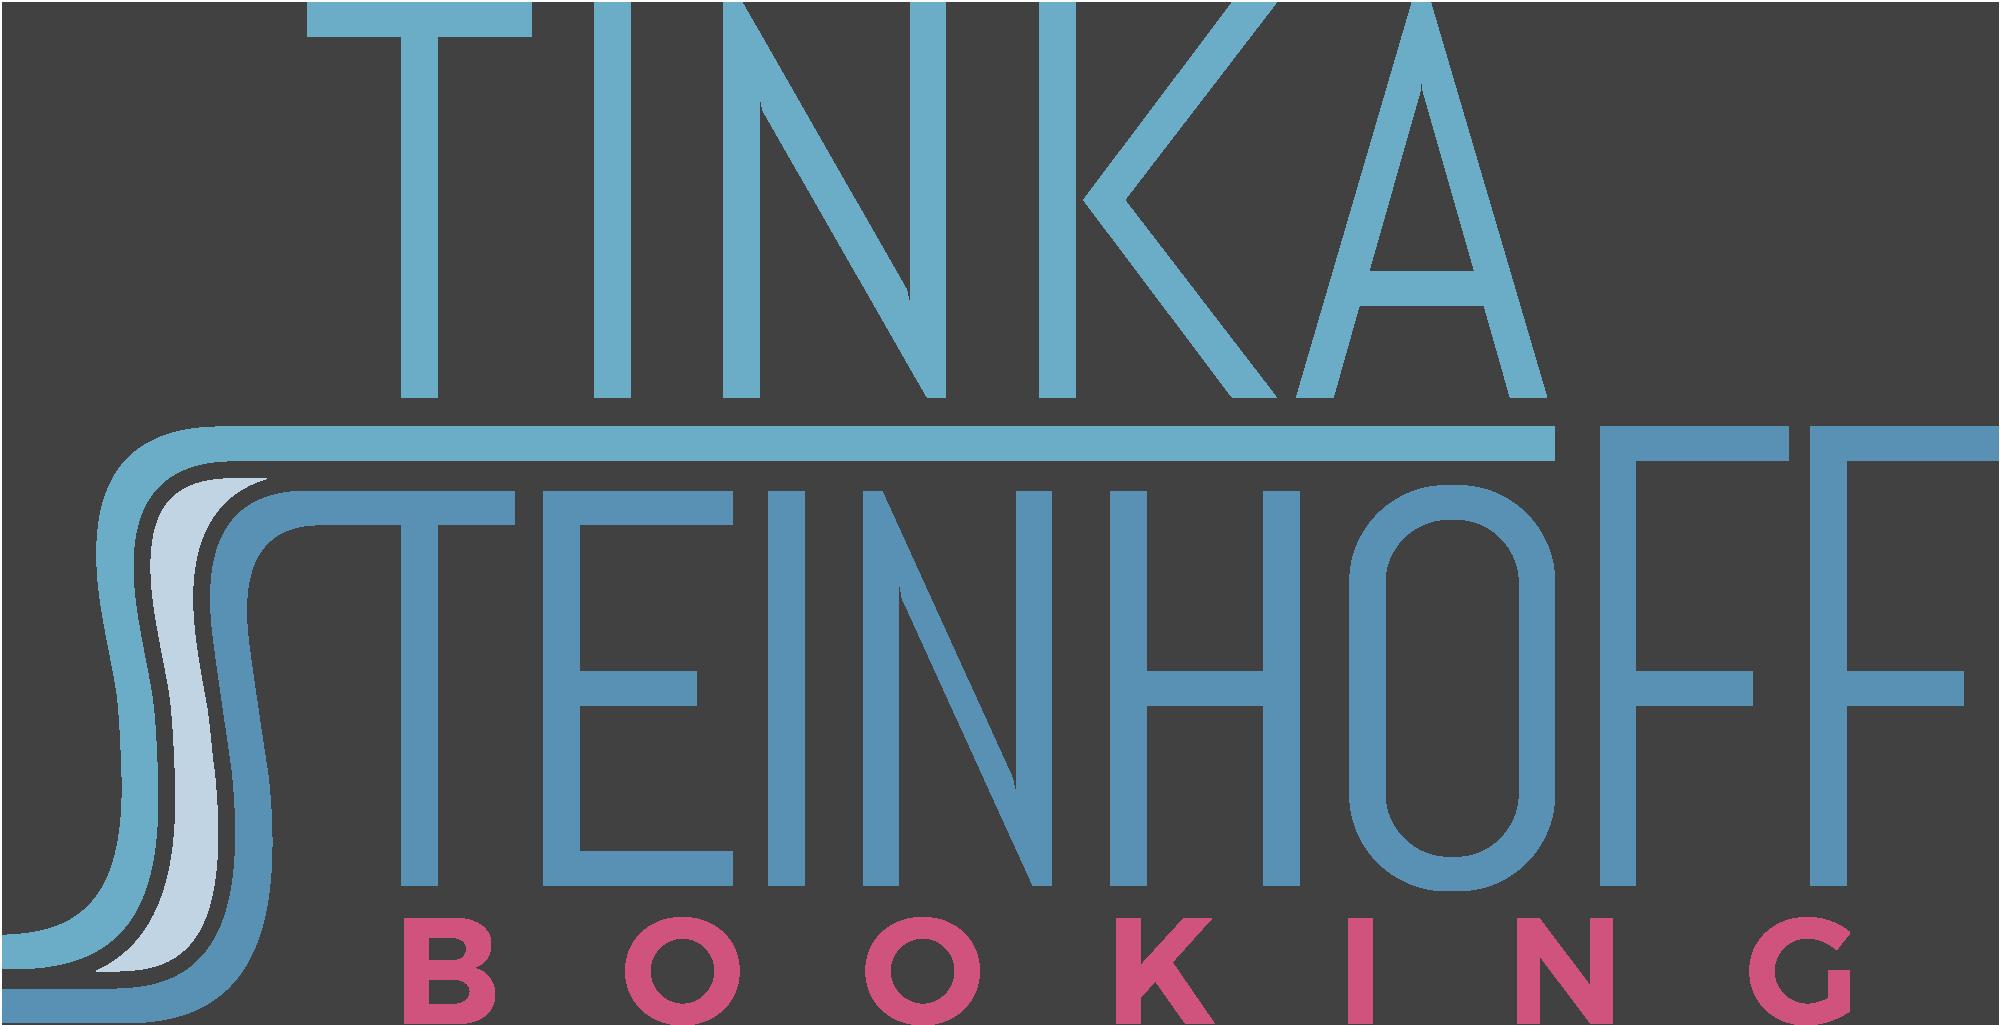 Tinka Steinhoff Booking